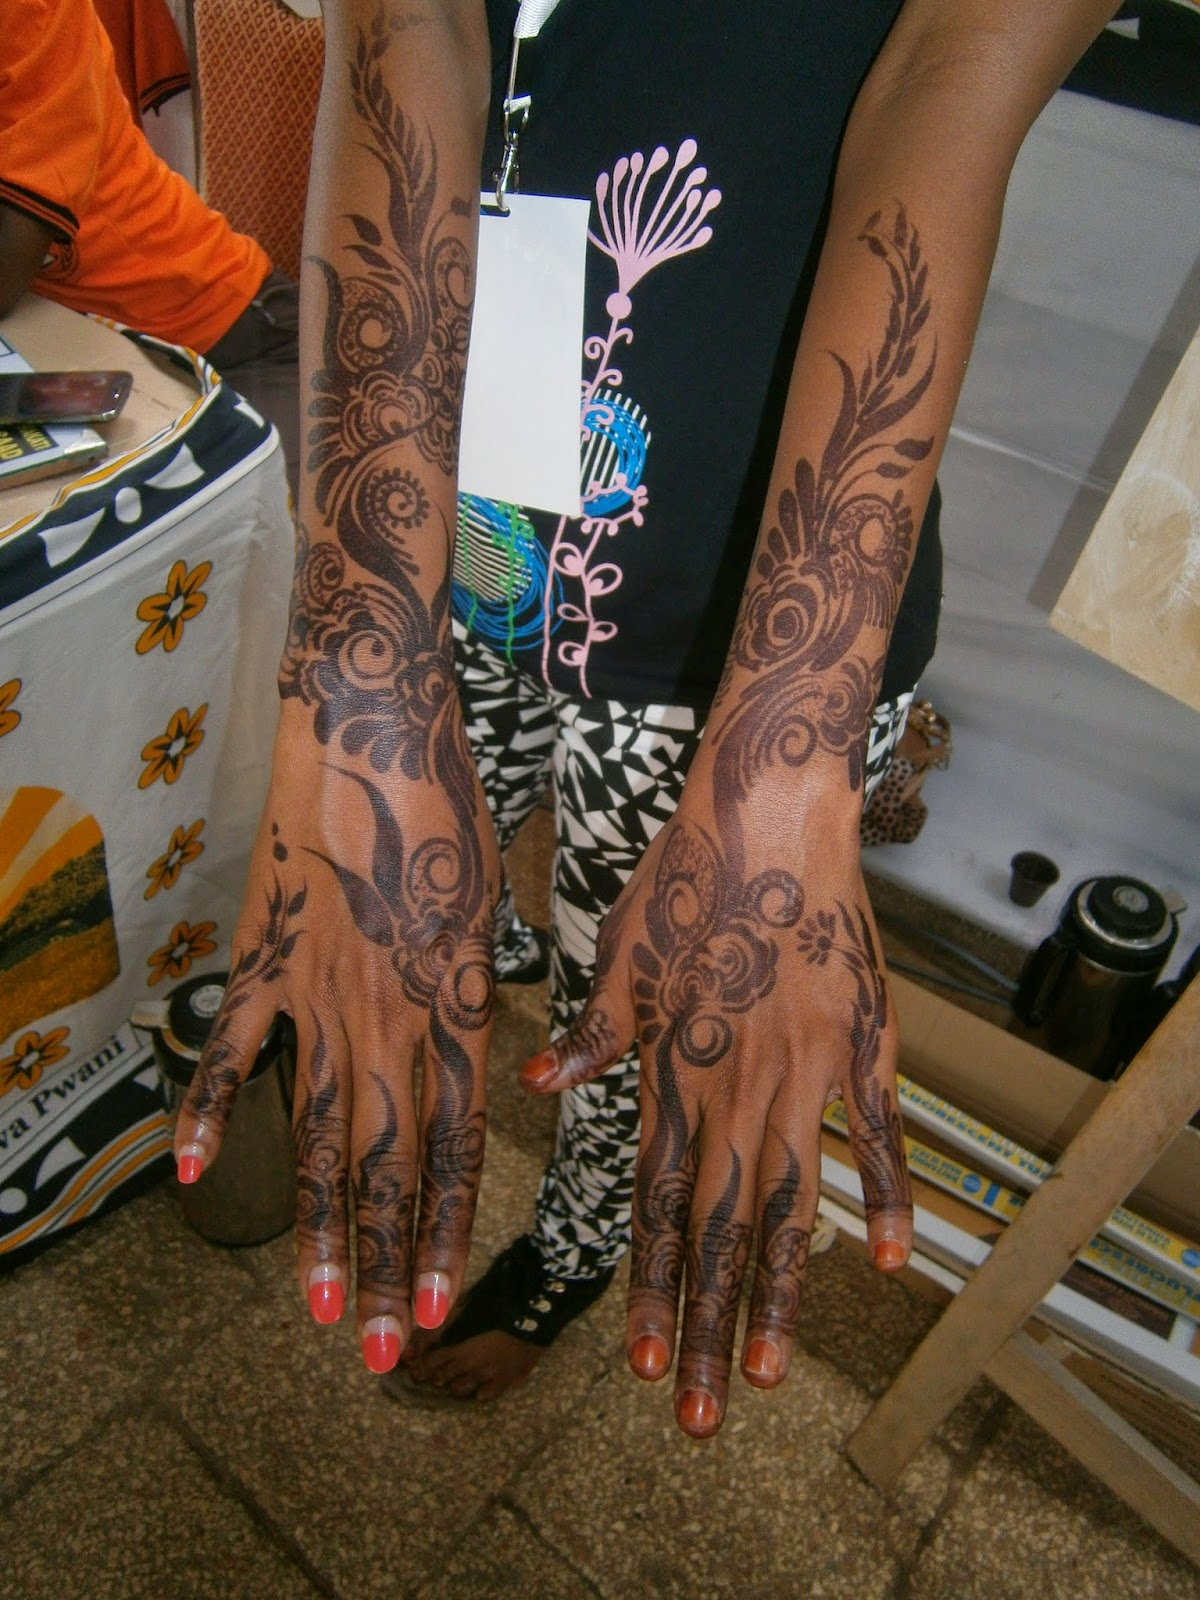 Janrwanda Wanawakes In Zanzibar And Blitzing The Blog With Photos